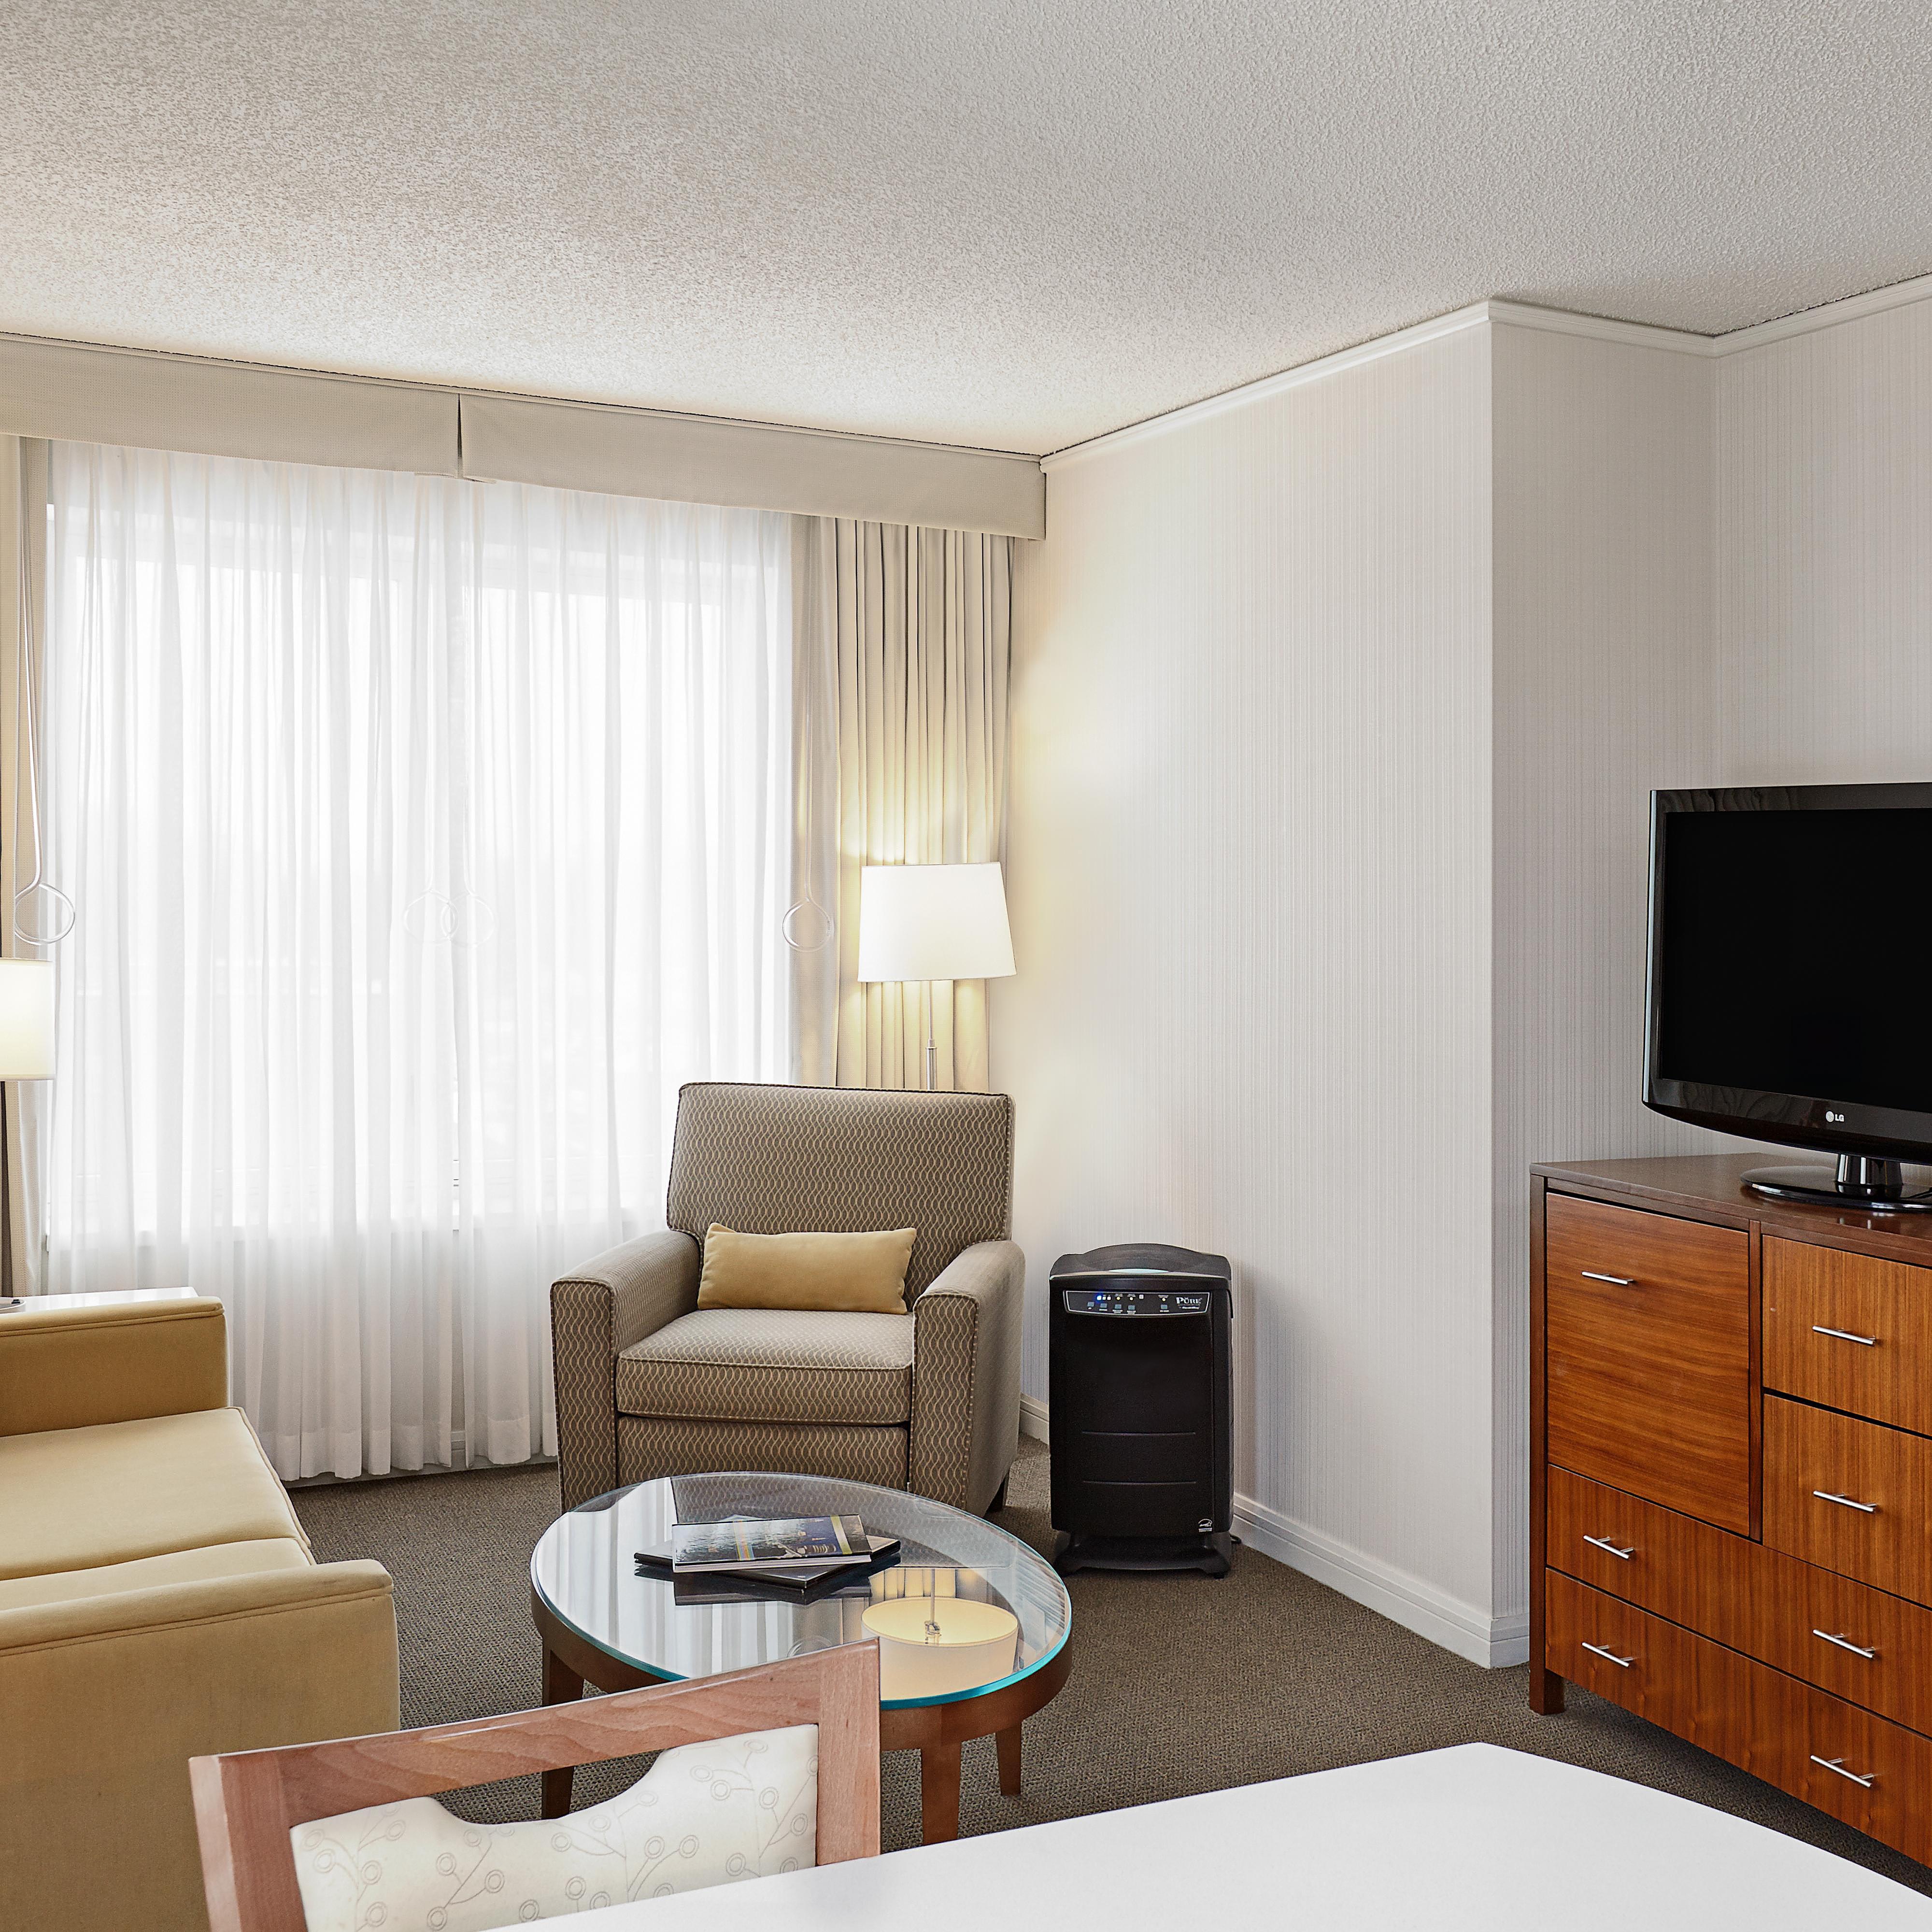 InterContinental Suites Hotel Cleveland - Cleveland Ohio